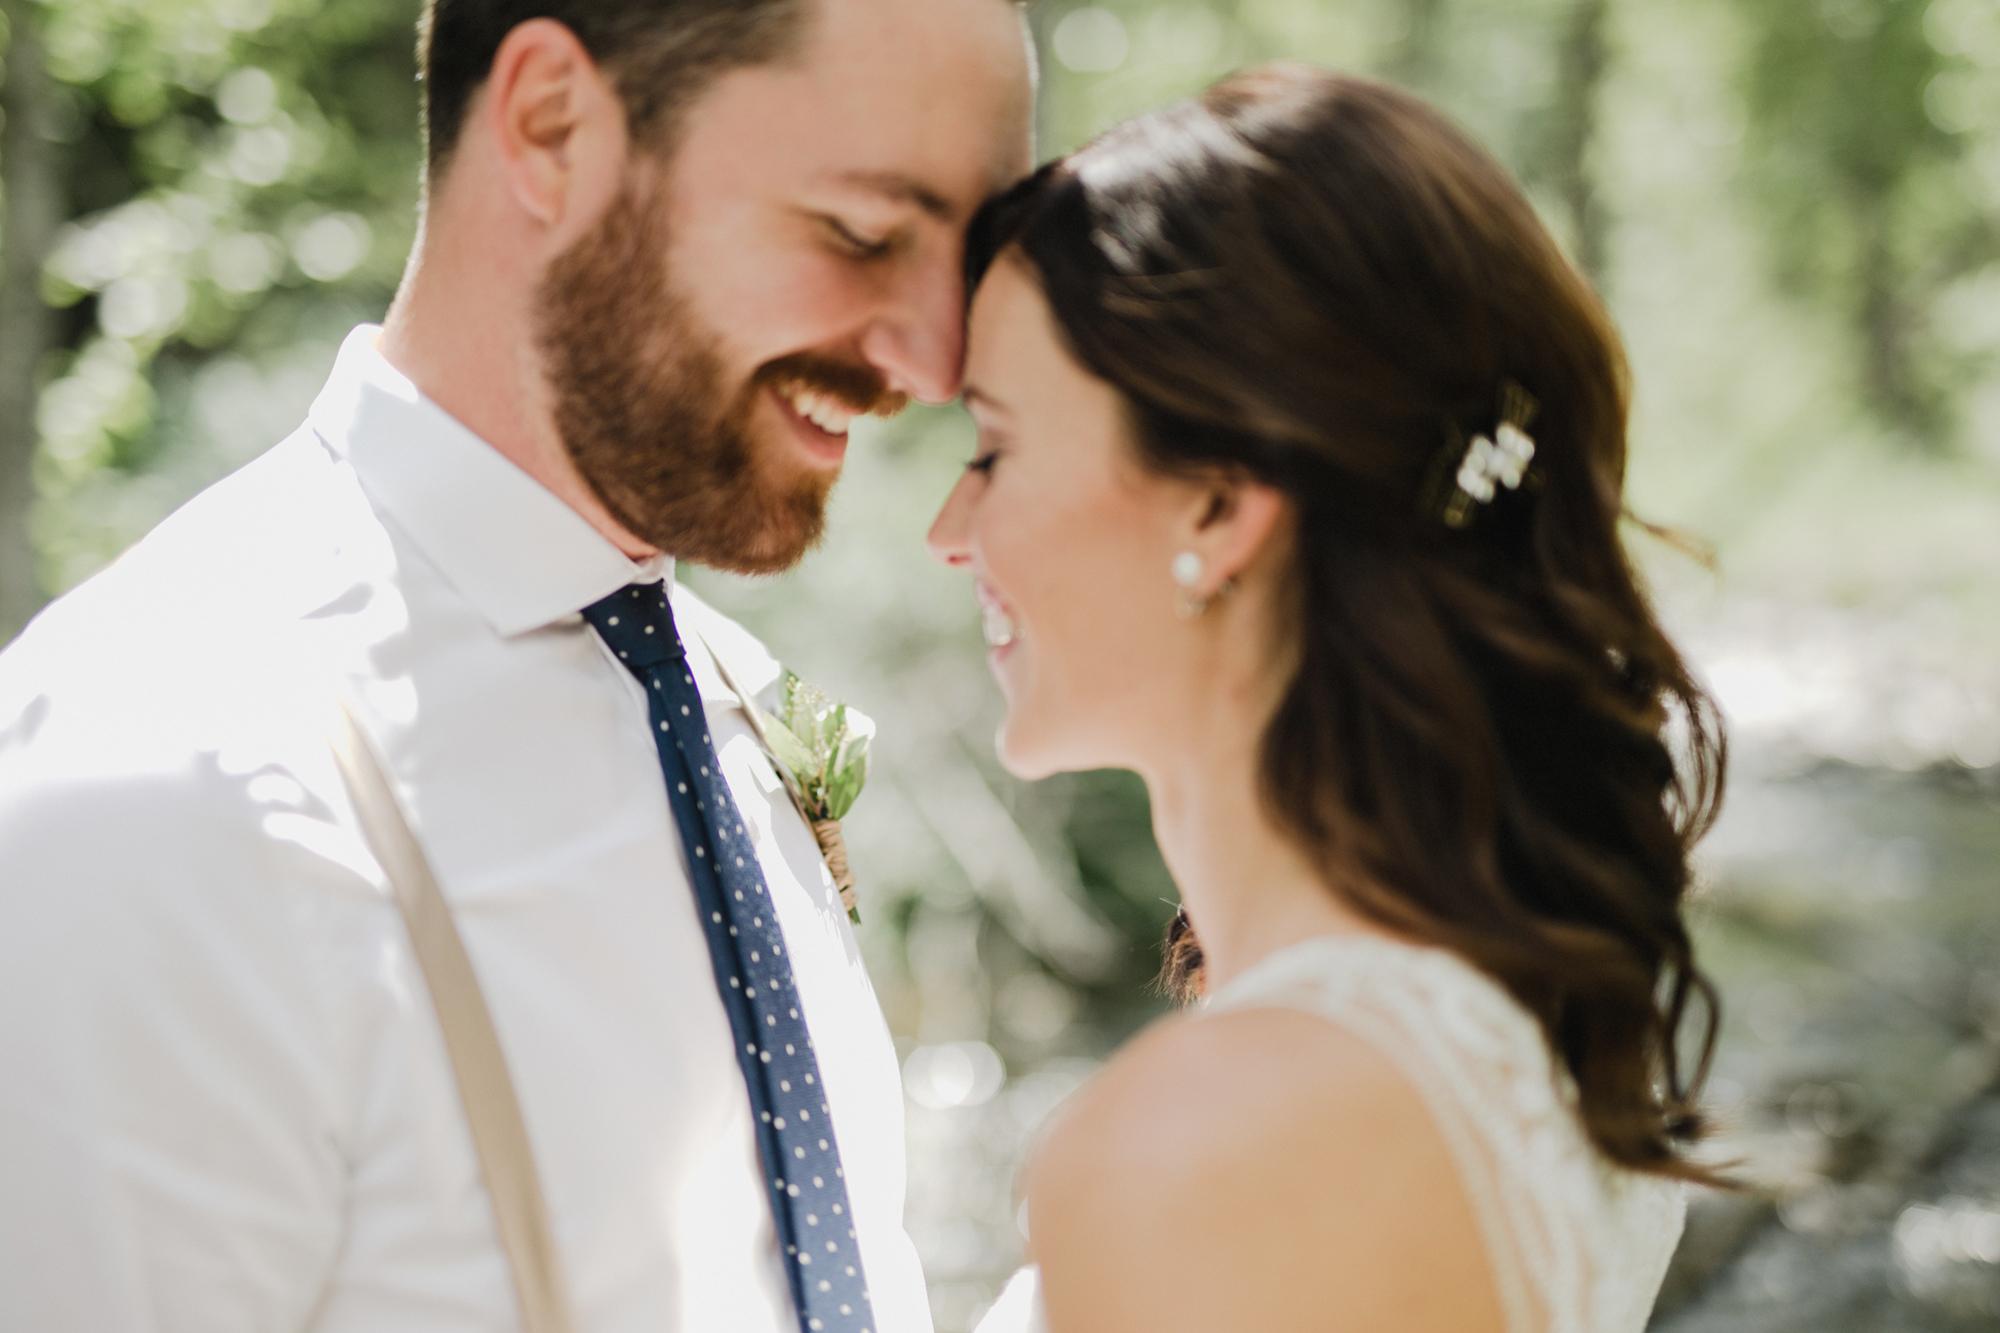 Flower Farm Crowsnest Pass Wedding -042.JPG